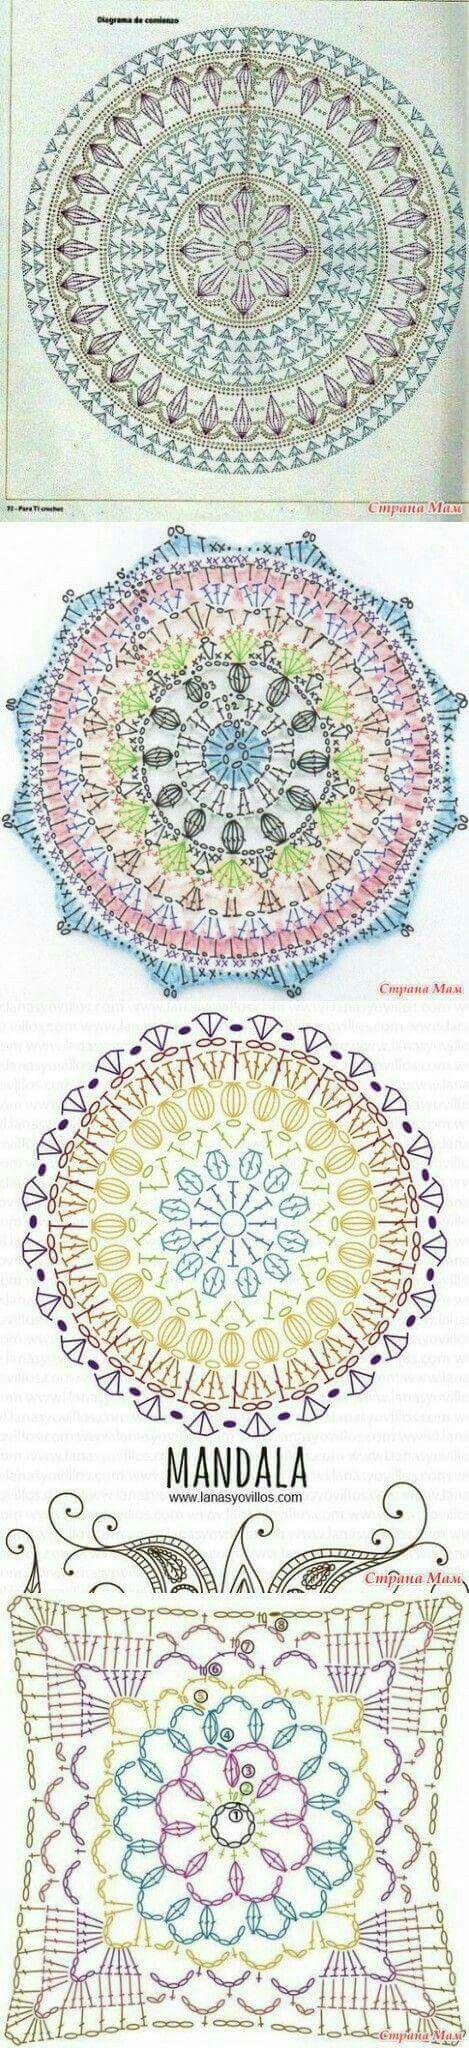 free charts for mandala | Sophie - Mandala | Pinterest | Mandalas ...